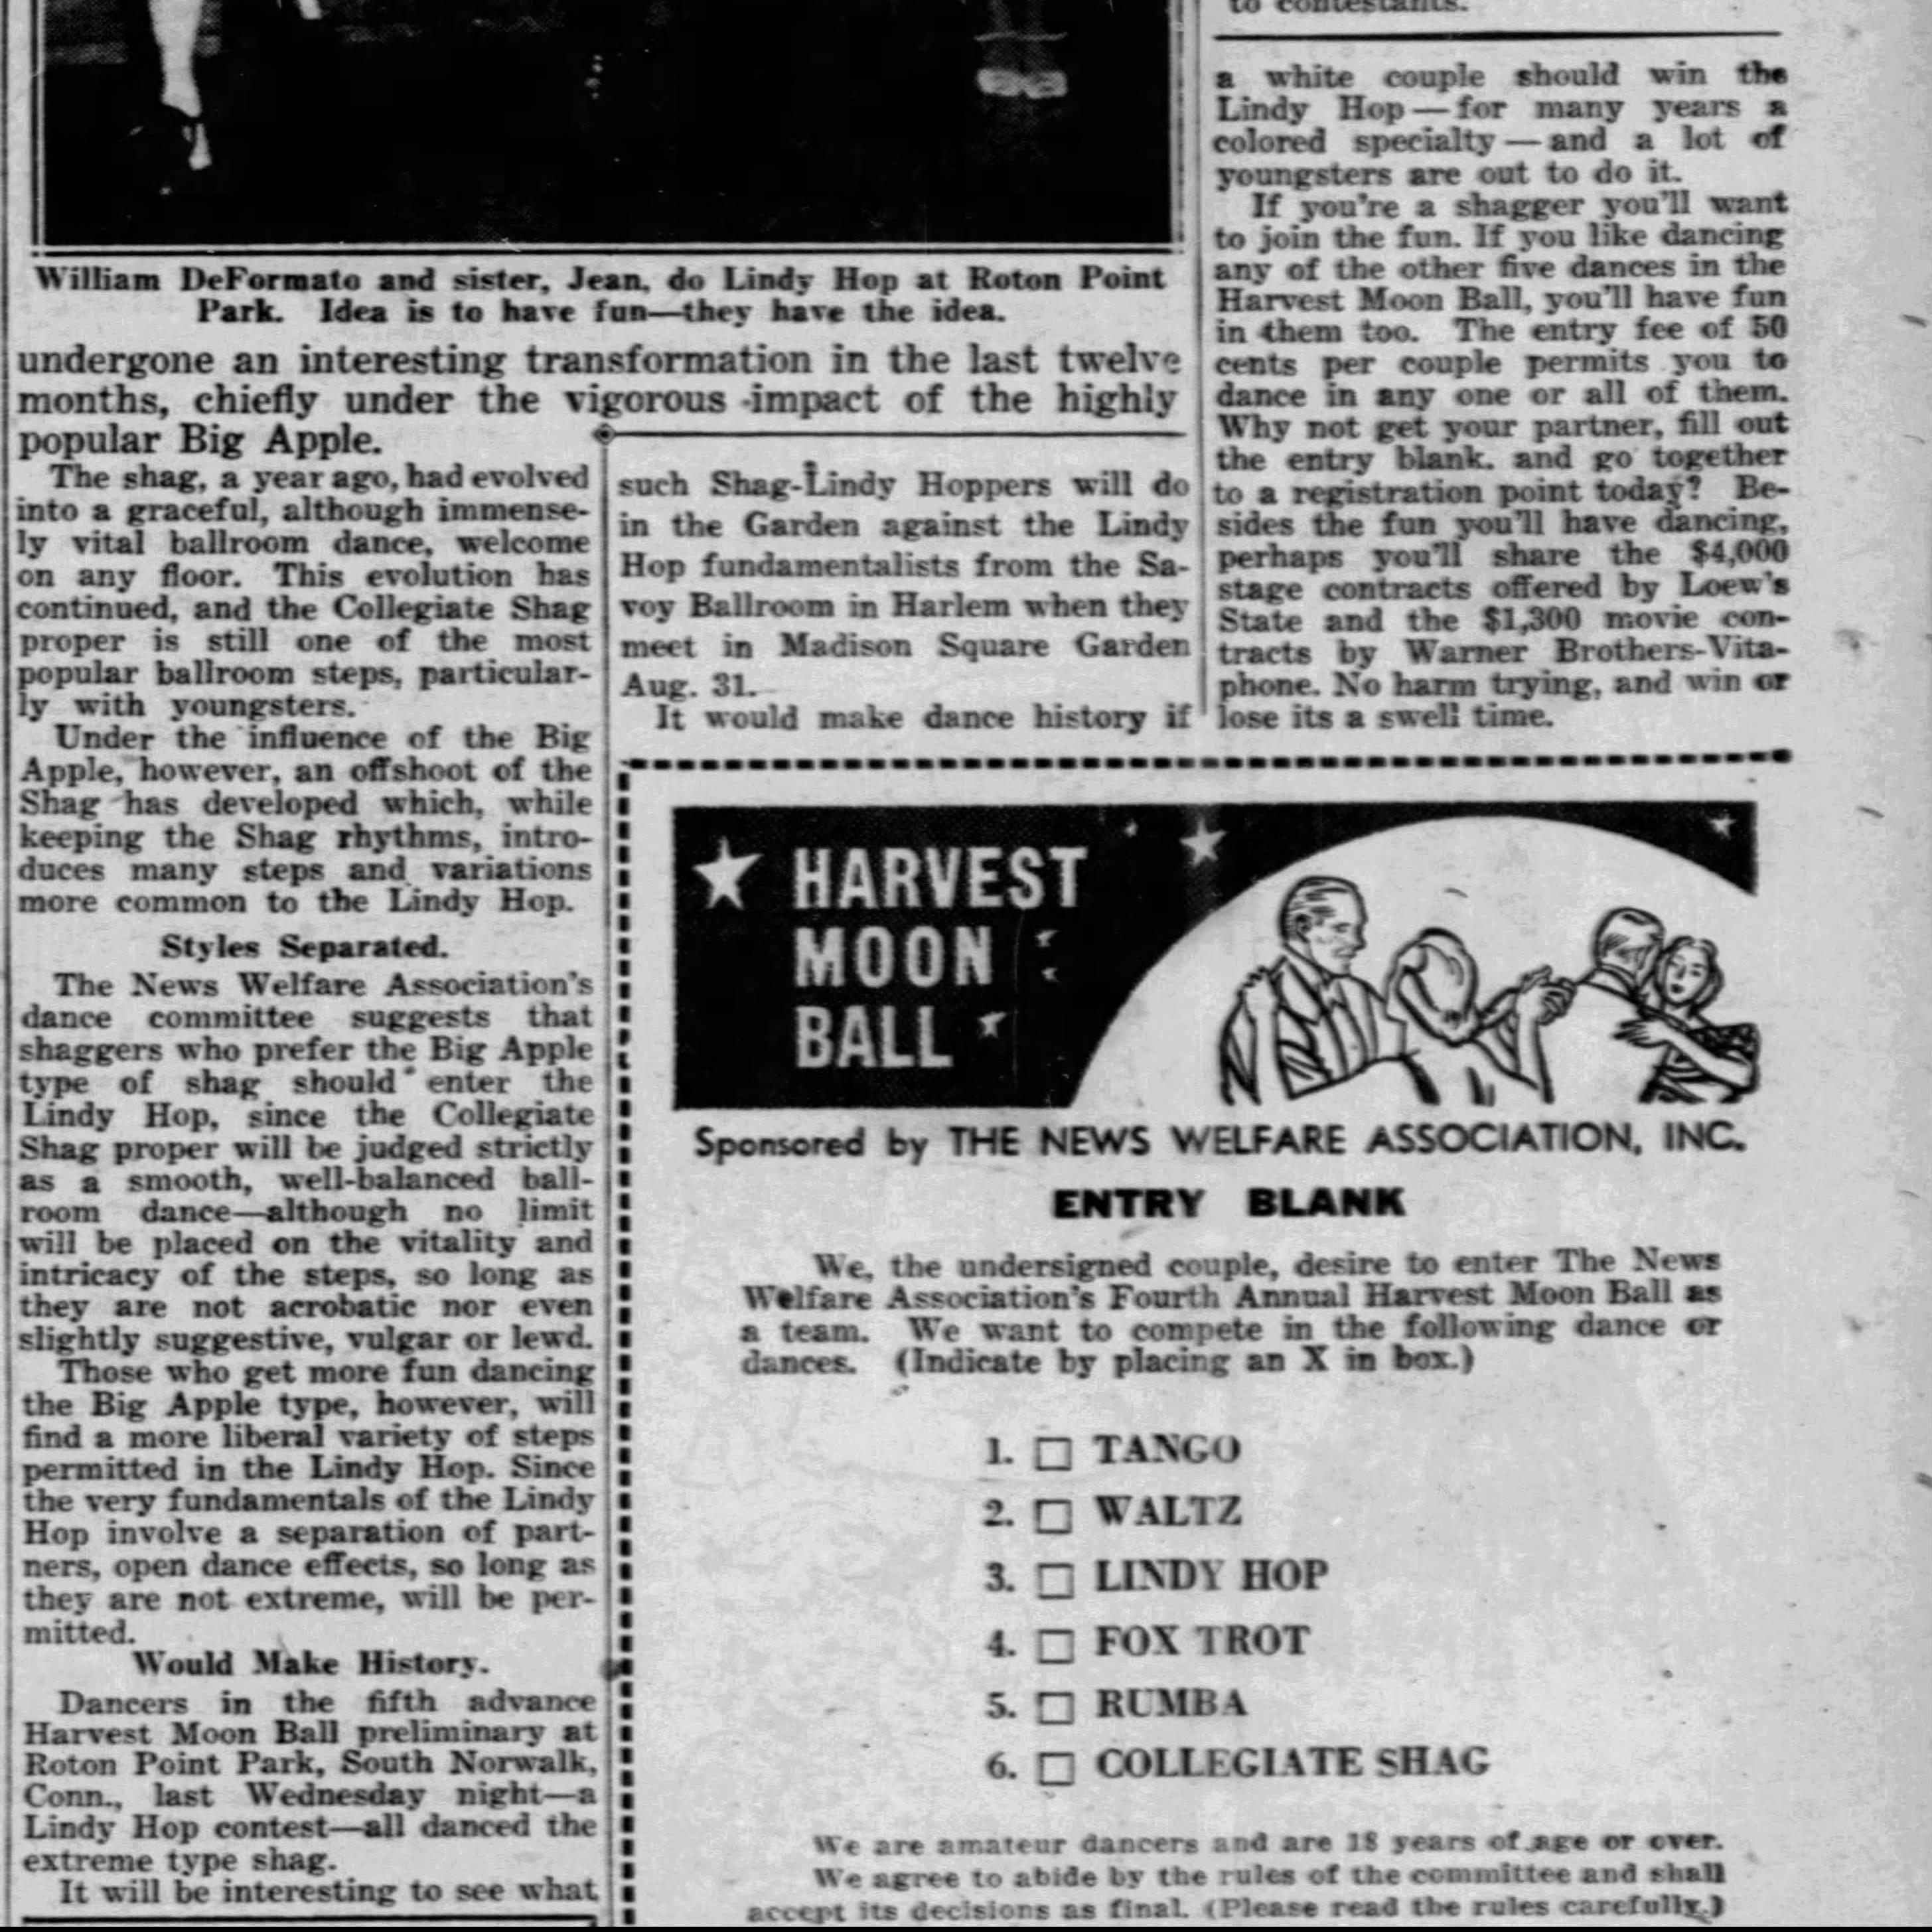 1938 BIG APPLE shag vs other shag Daily_News_Sat__Jul_23__1938_